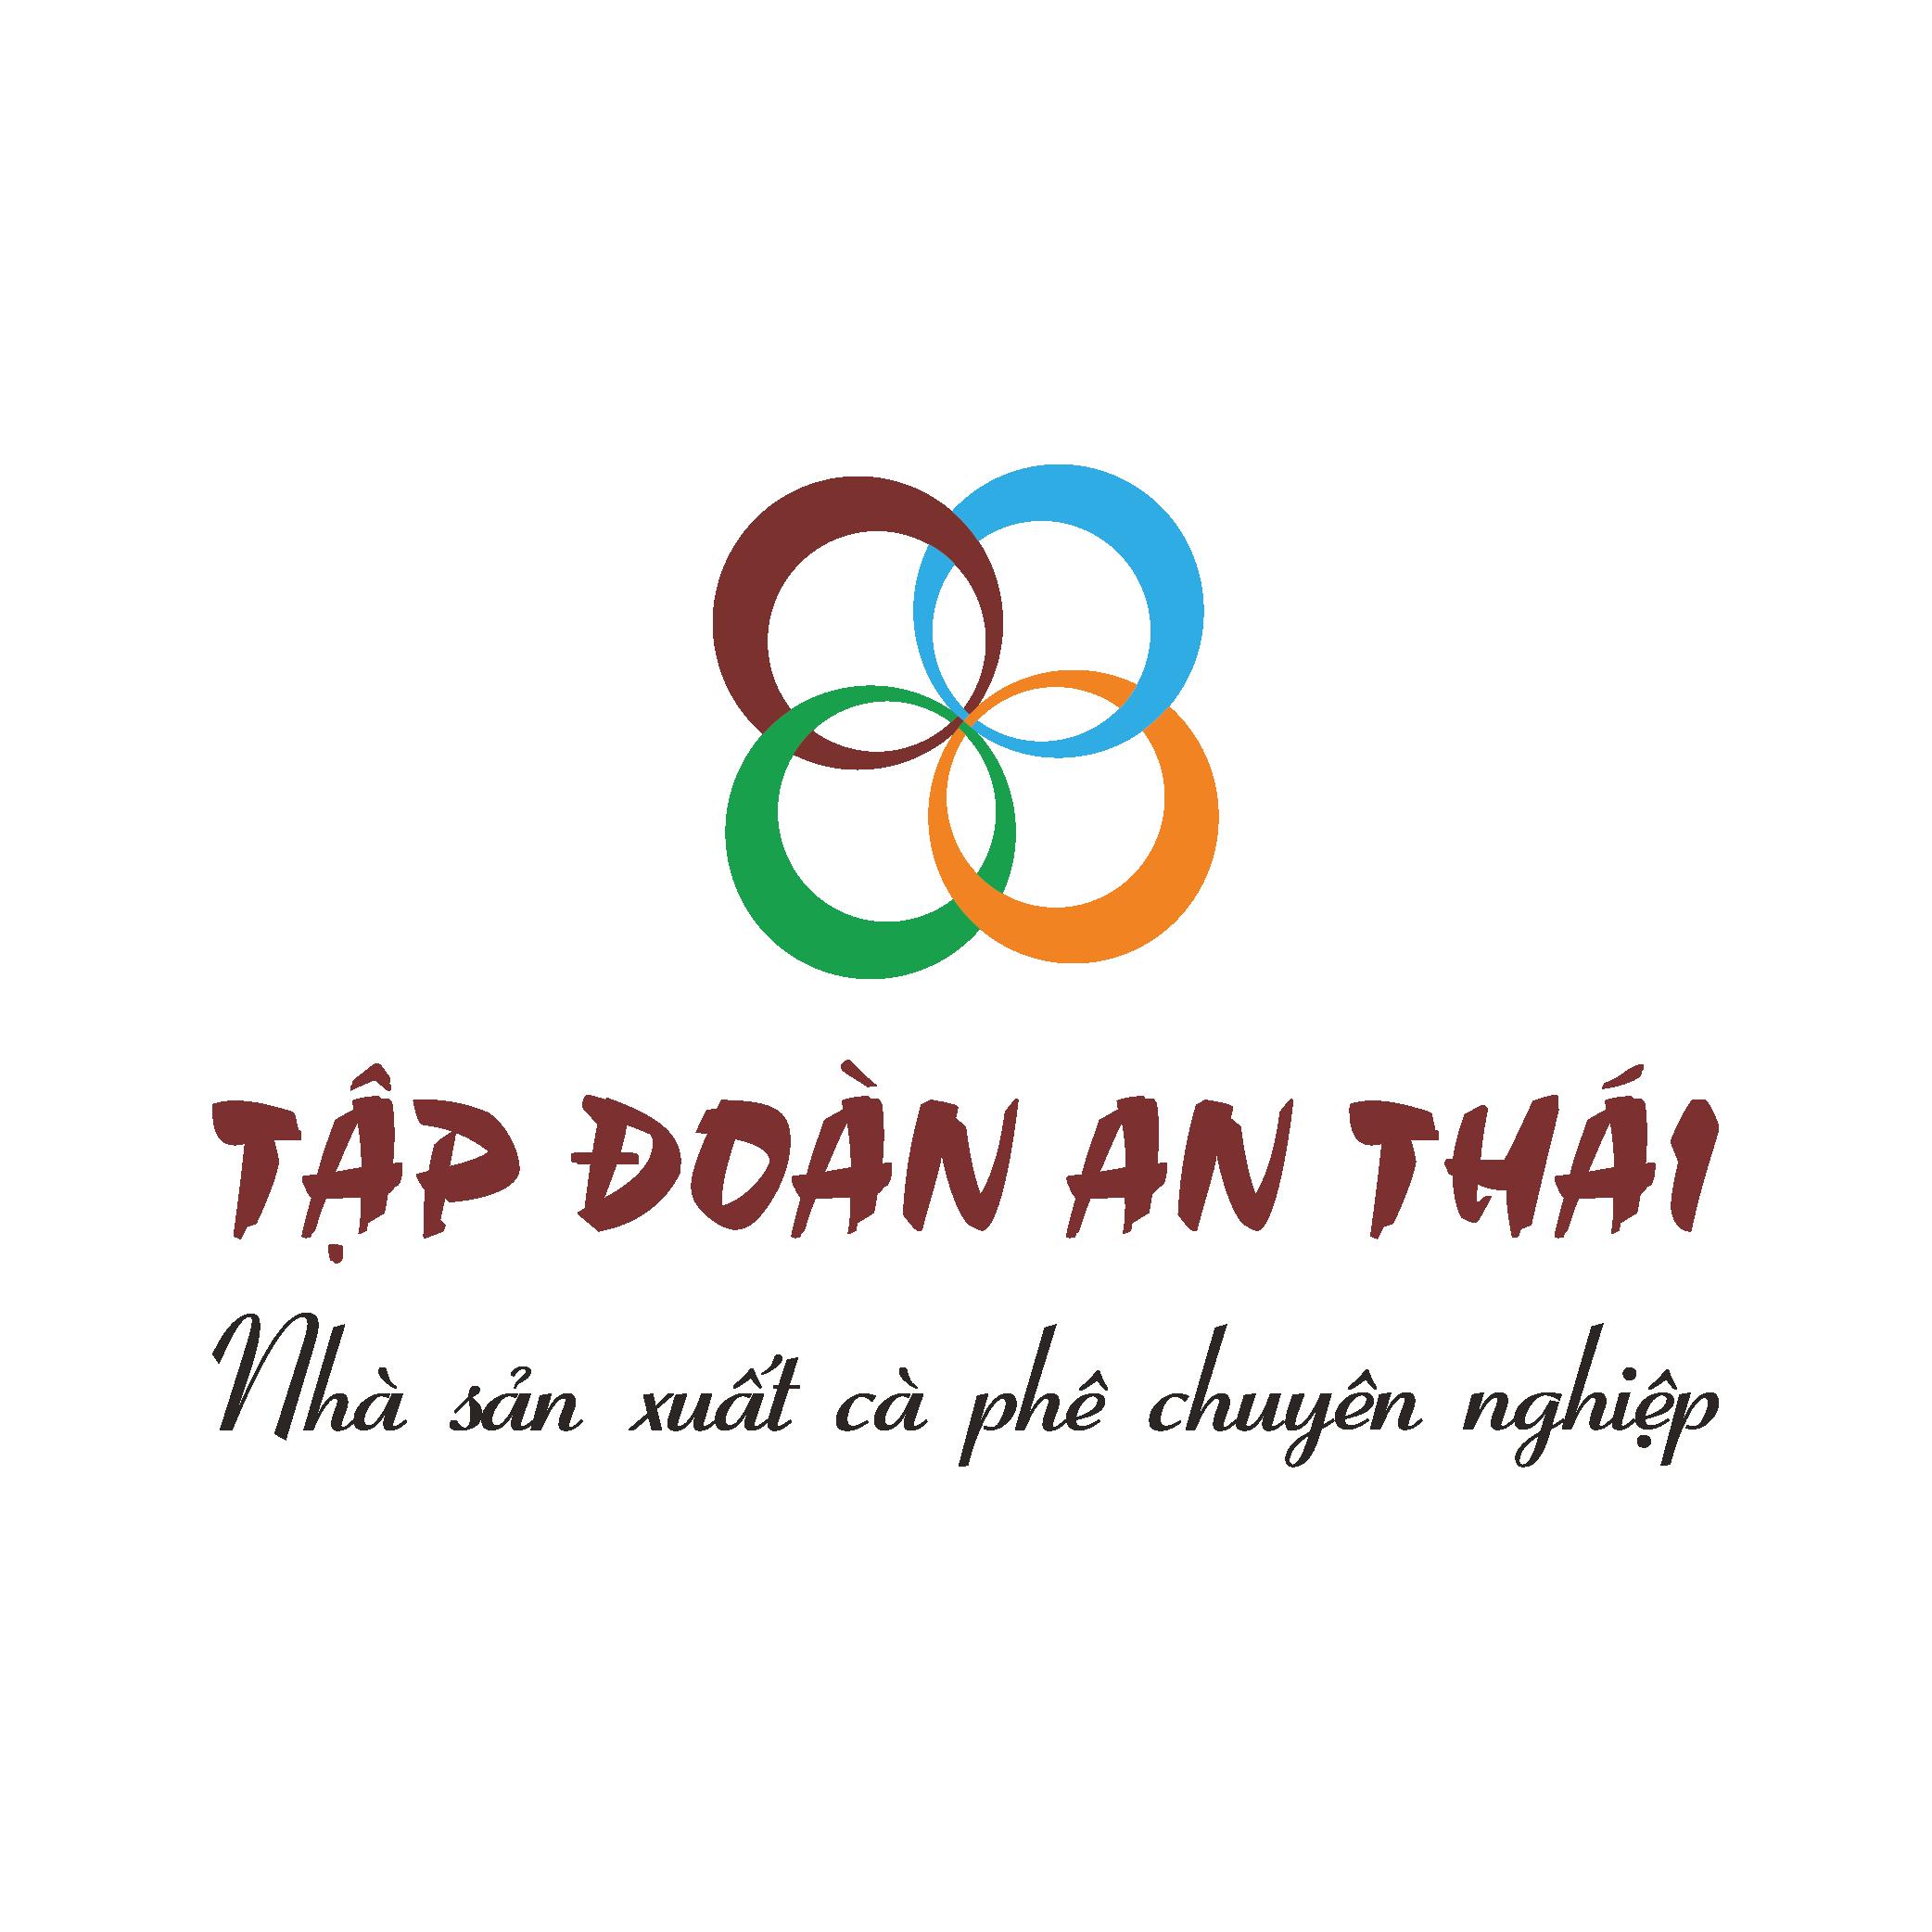 AN THAI VIET NAM